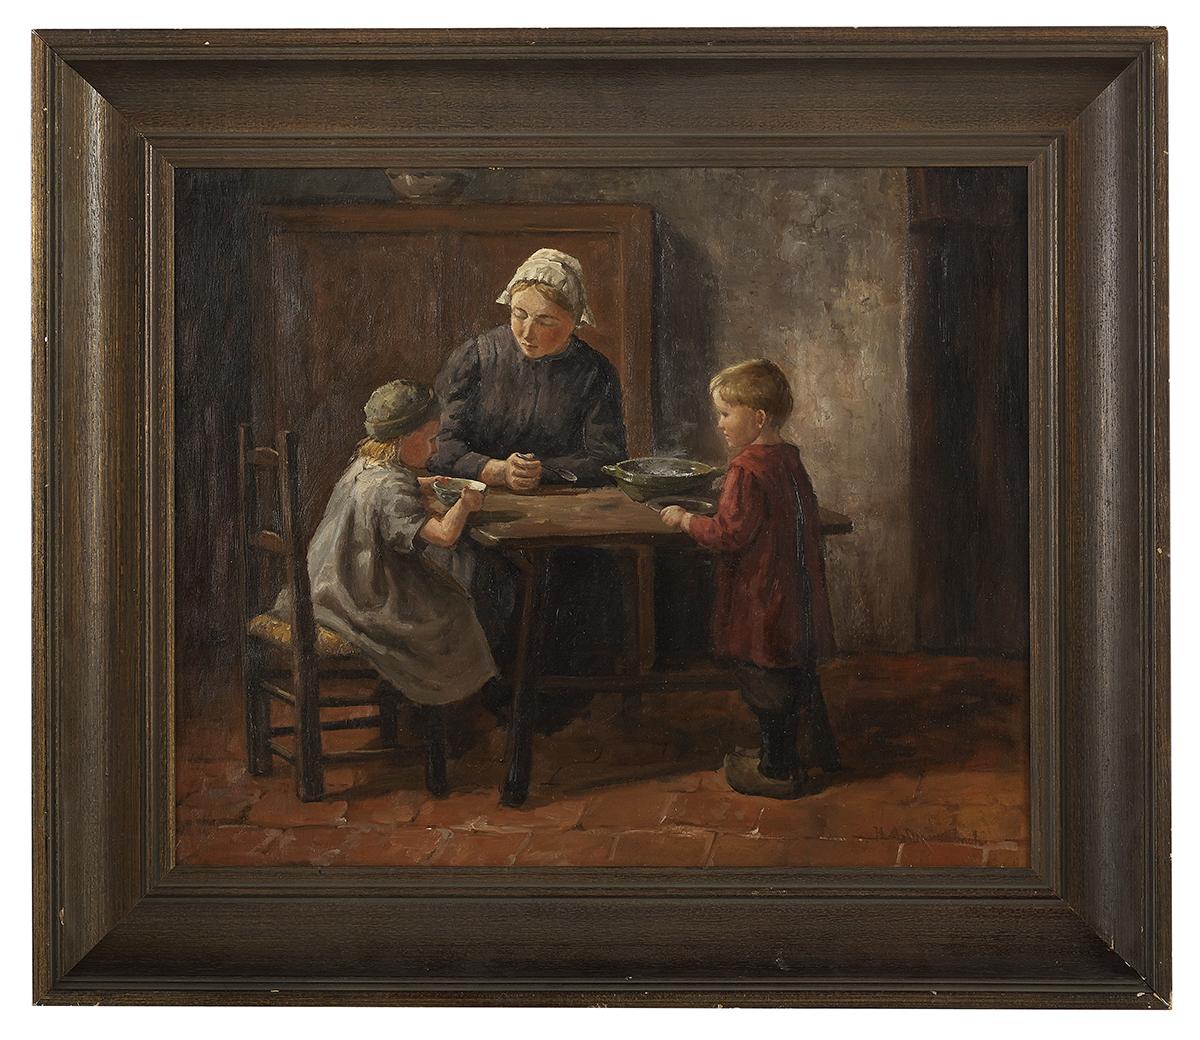 Lot 90 - Hendricus Antonius Dievenbach, (Dutch, 1872-1946)